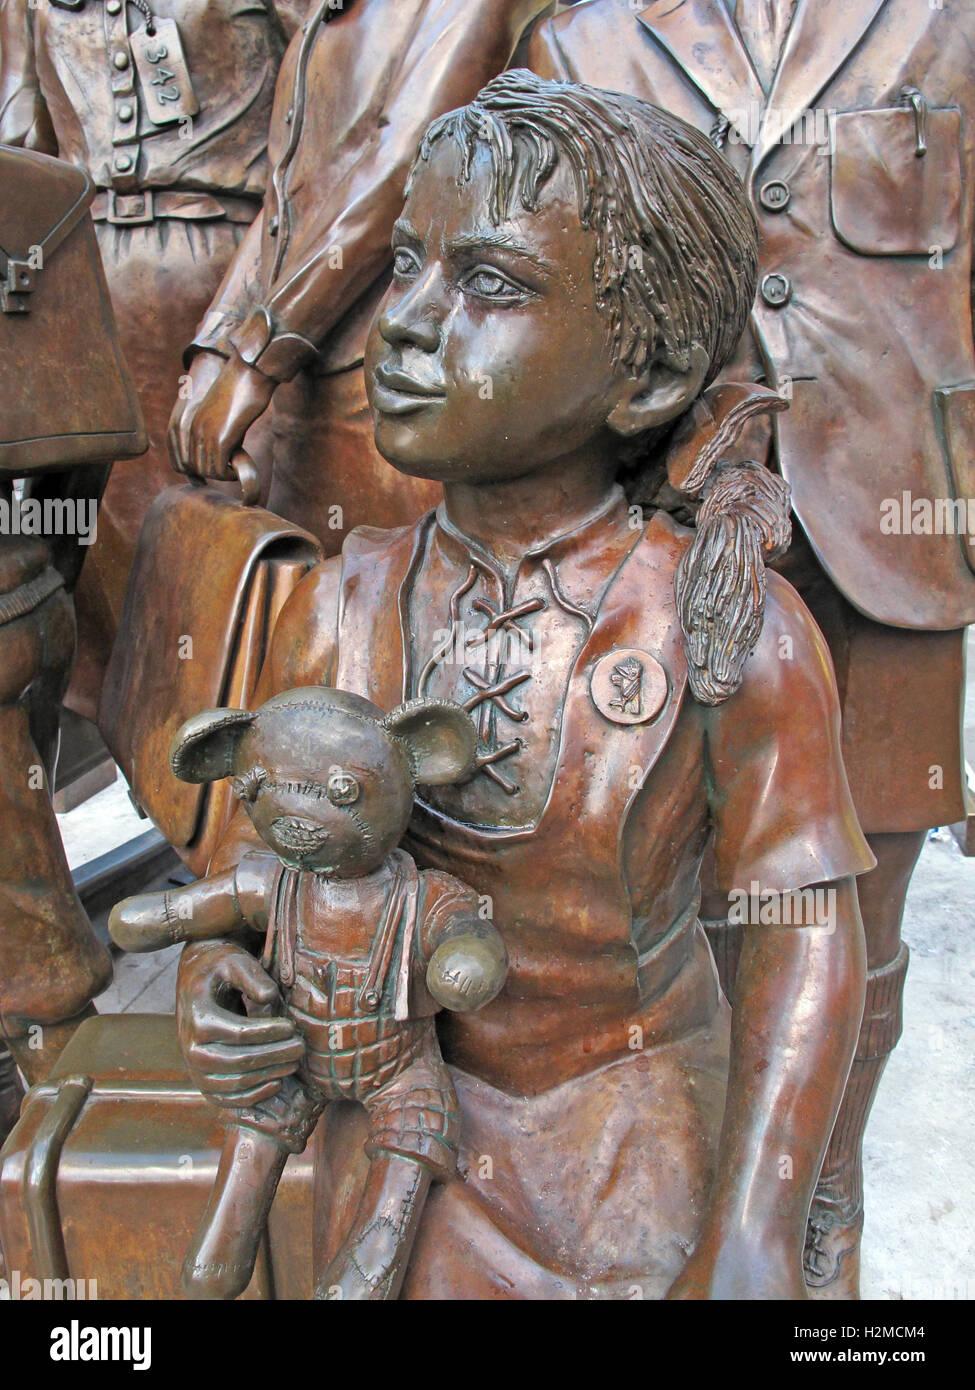 Kindertransport statues, Liverpool St station,London,England,UK Stock Photo